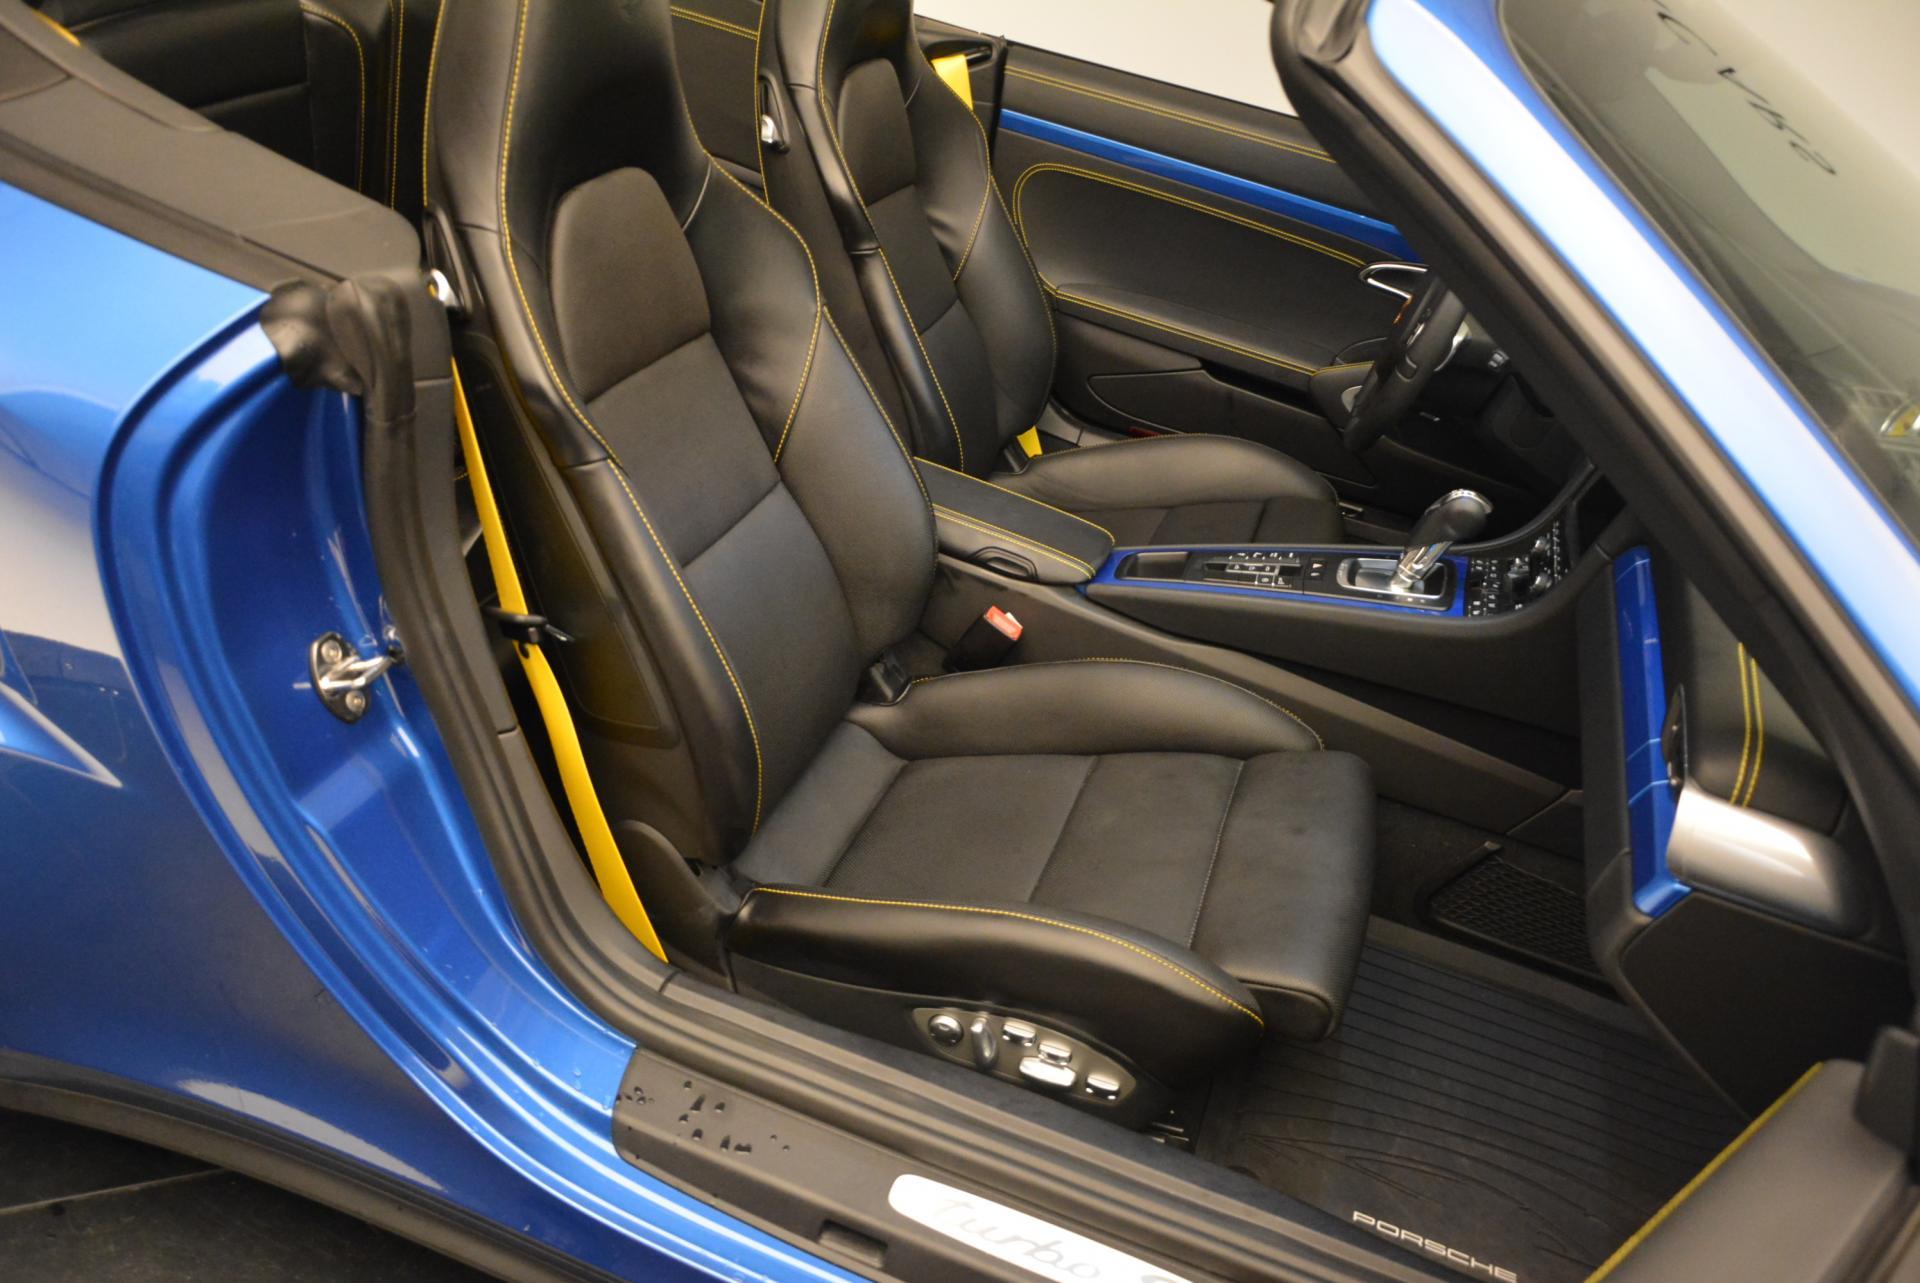 Used 2014 Porsche 911 Turbo S For Sale In Greenwich, CT 105_p23